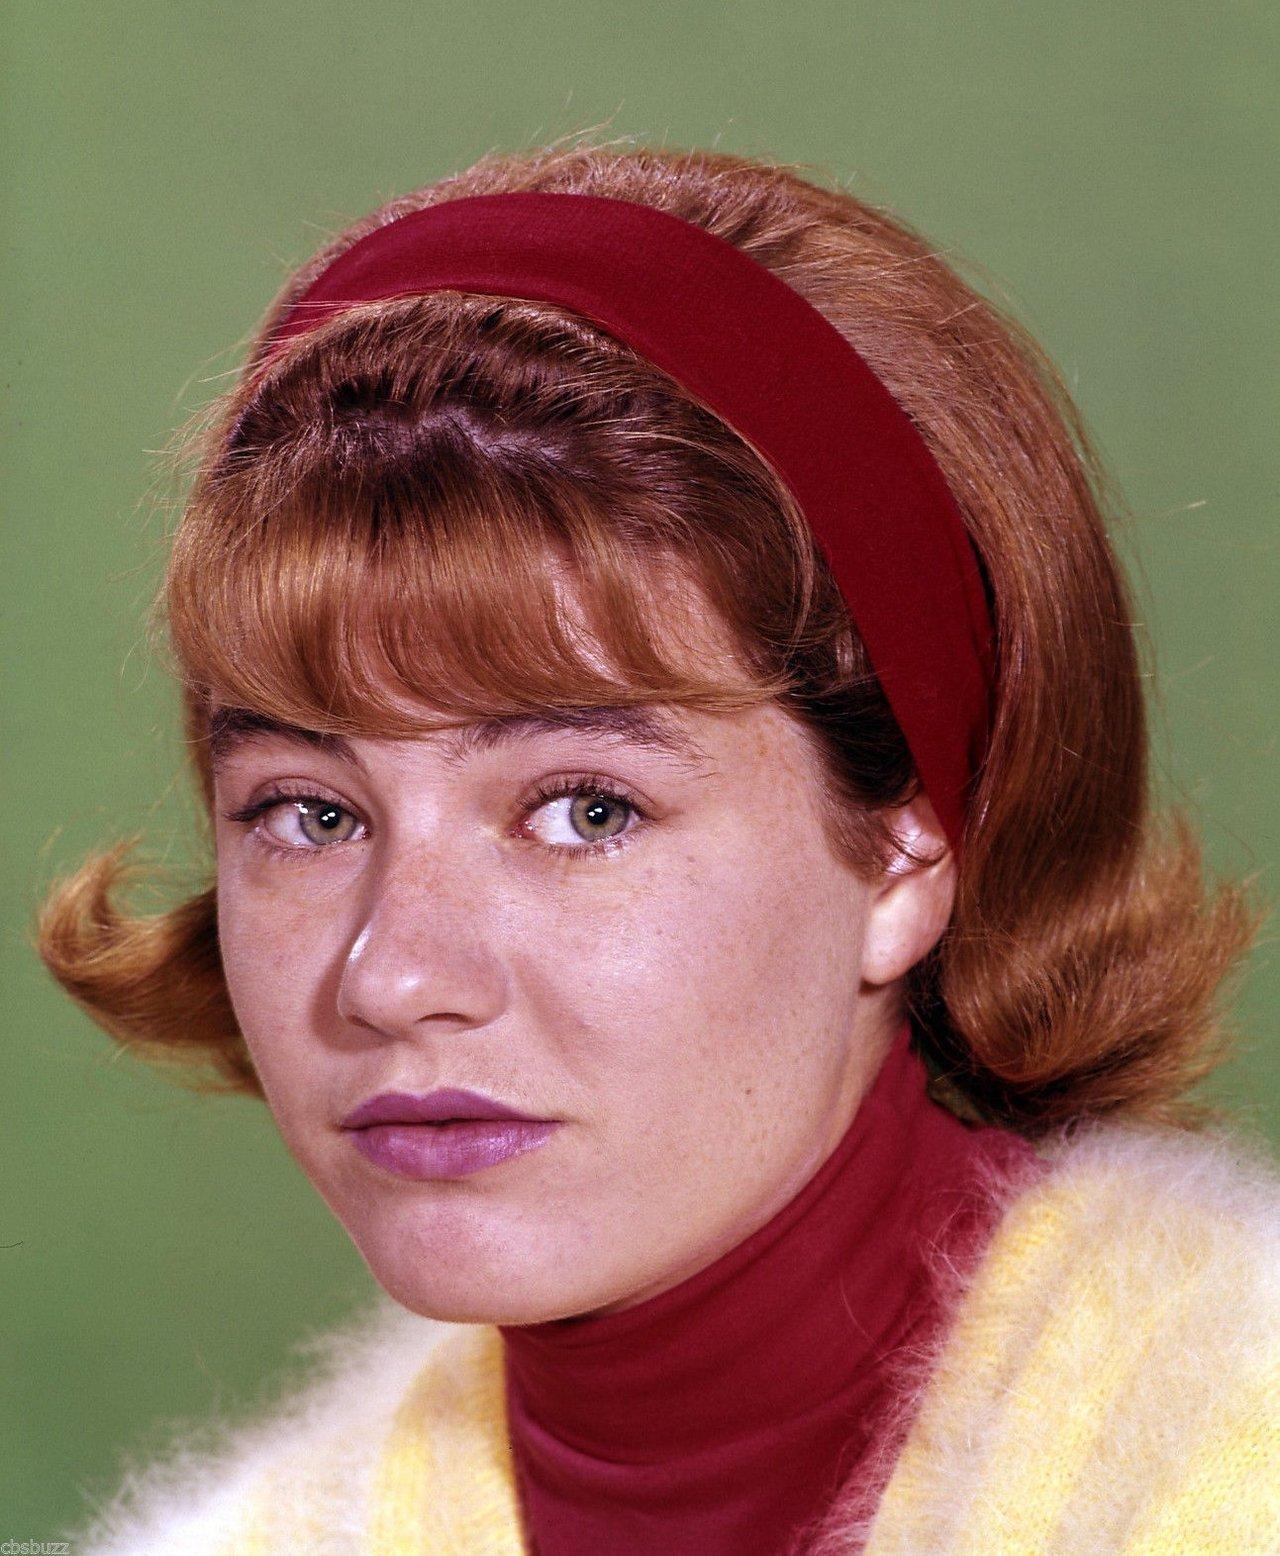 Patty Duke, 1960s. #Patty Duke #The Patty Duke Show #1960s#vintage#1960s fashion#60s hair